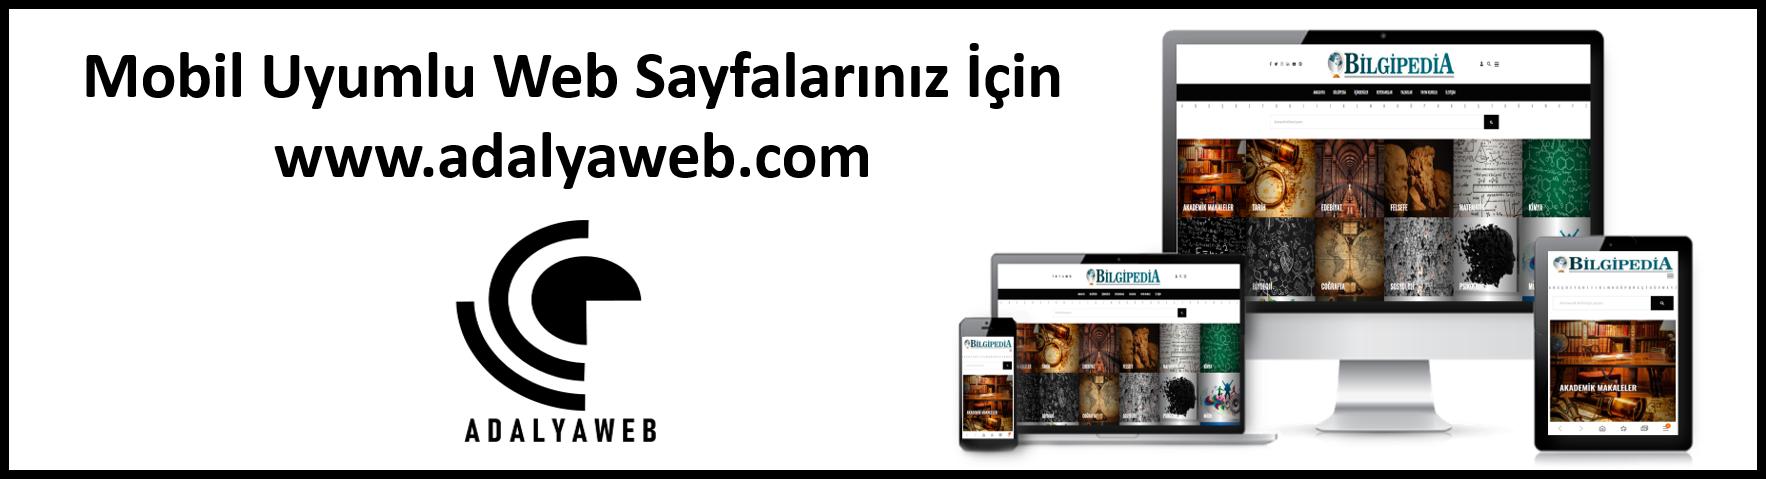 AdalyaWeb Bilgipedia Reklam